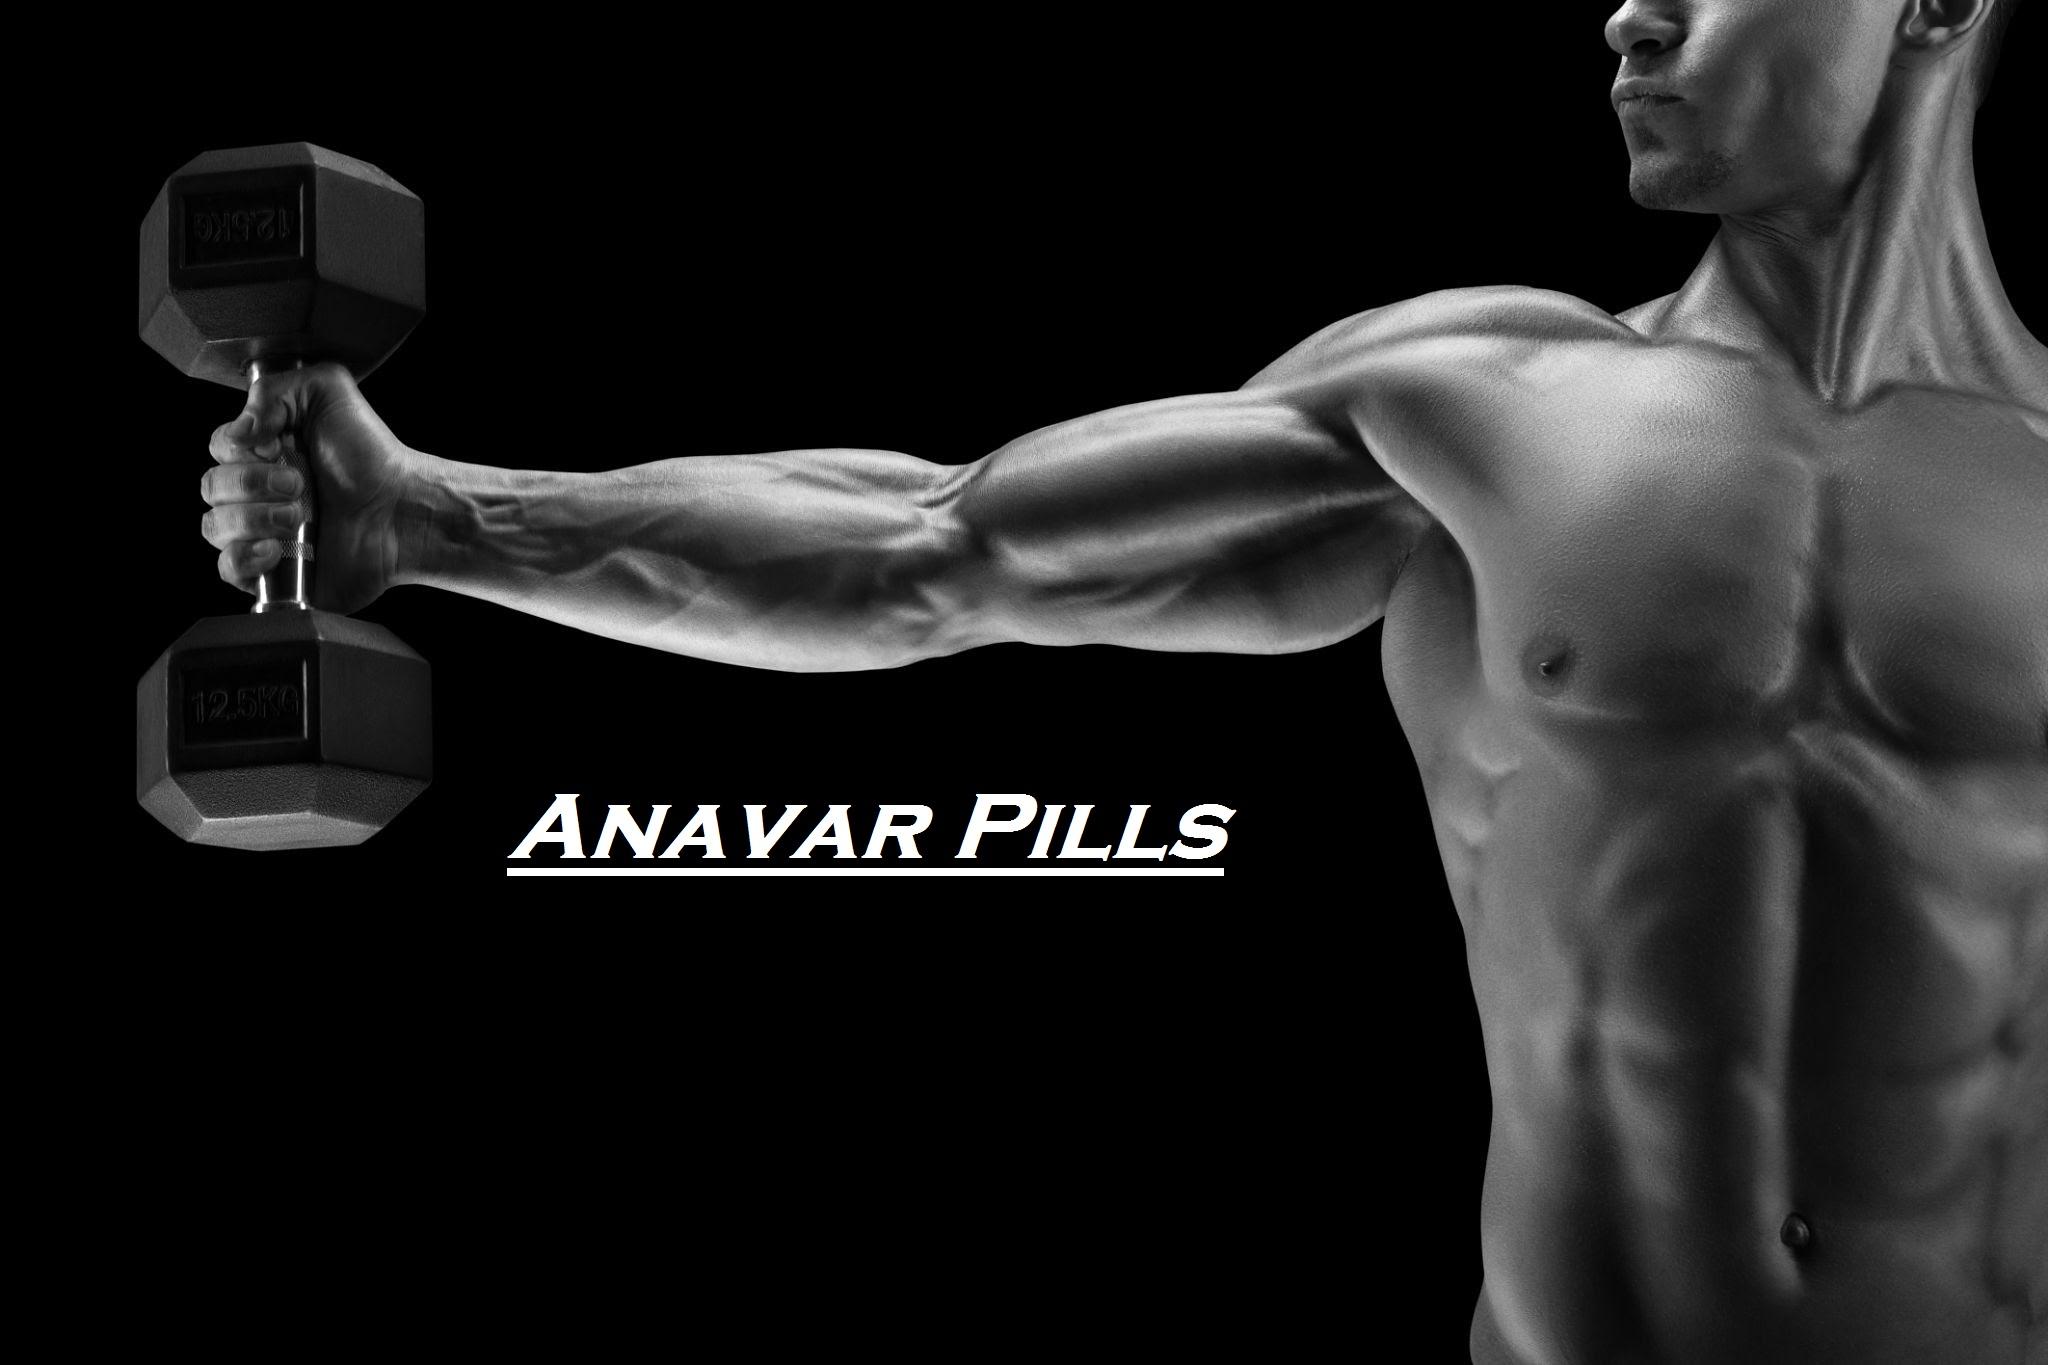 Anavar-pills